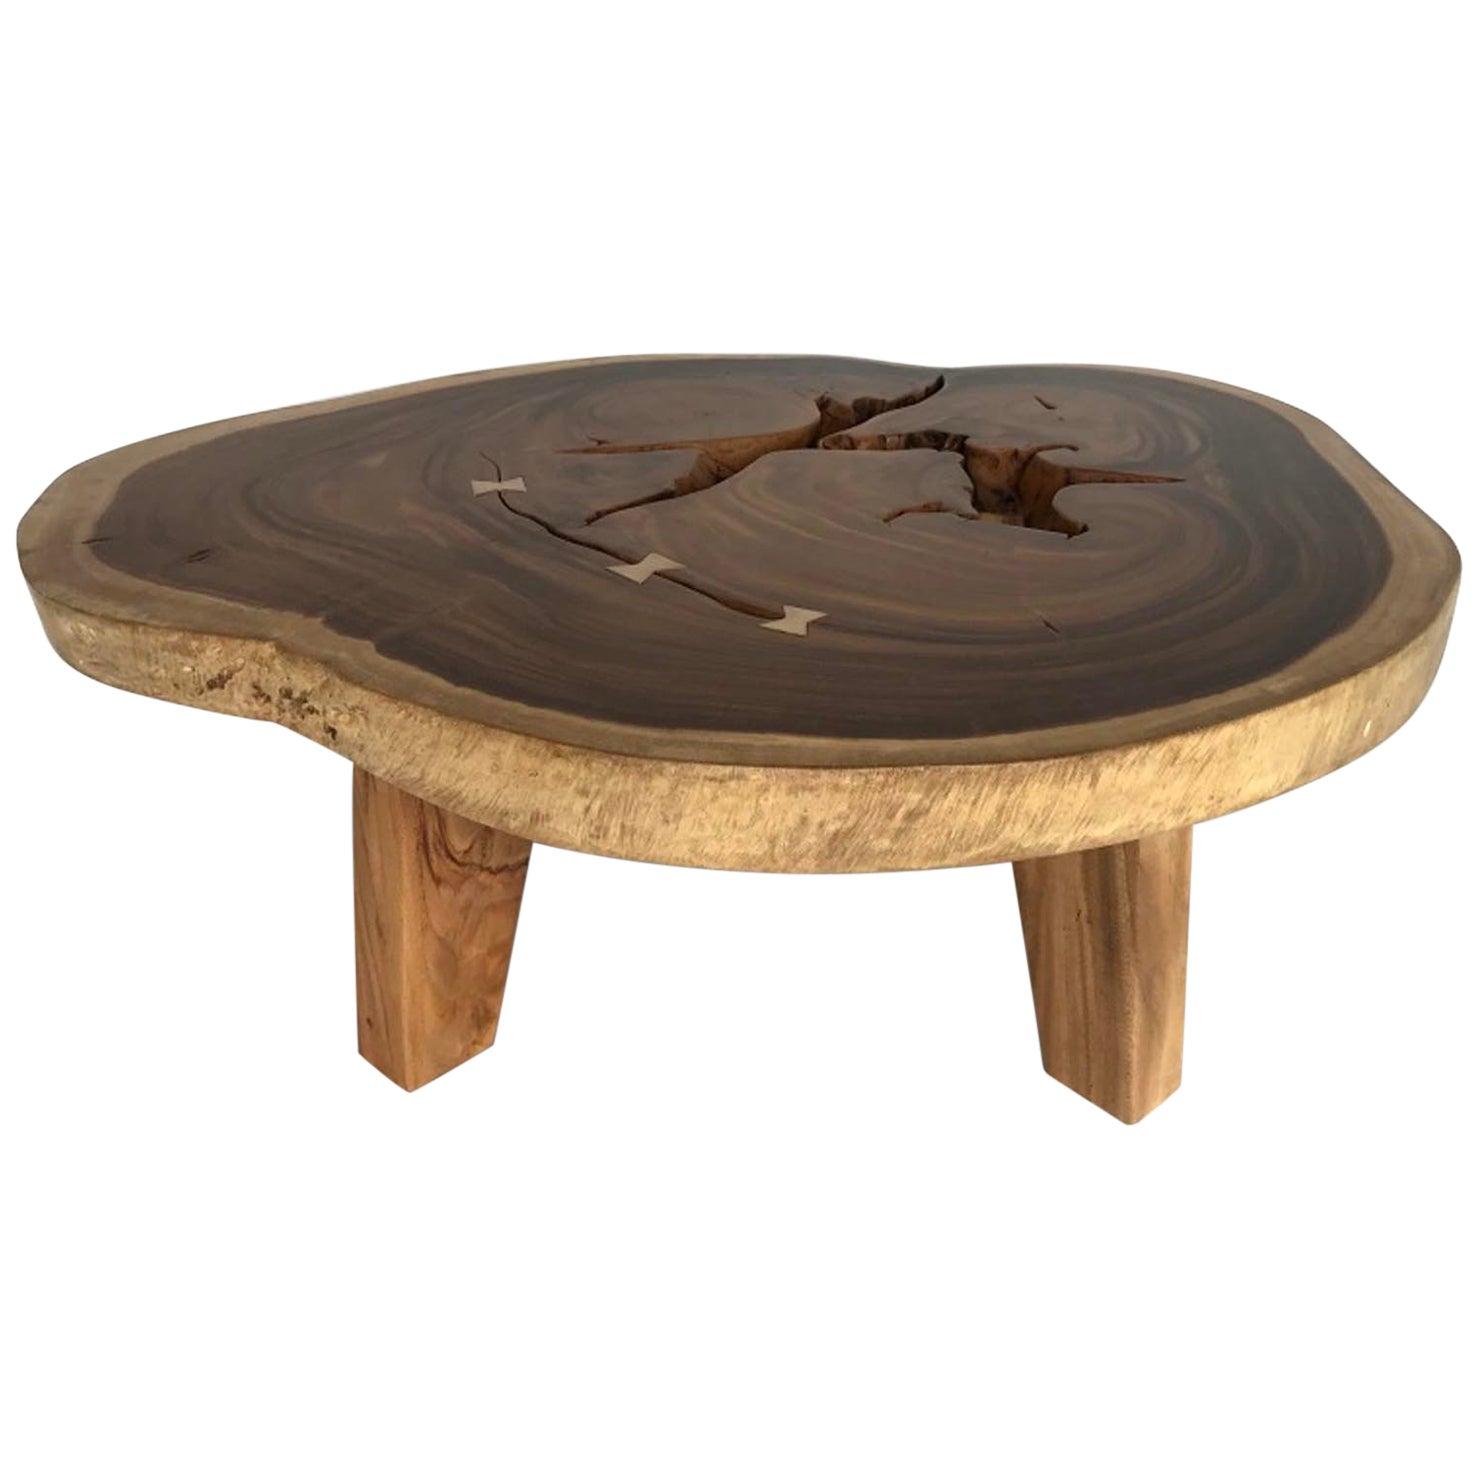 Free-Form Wood Coffee Table